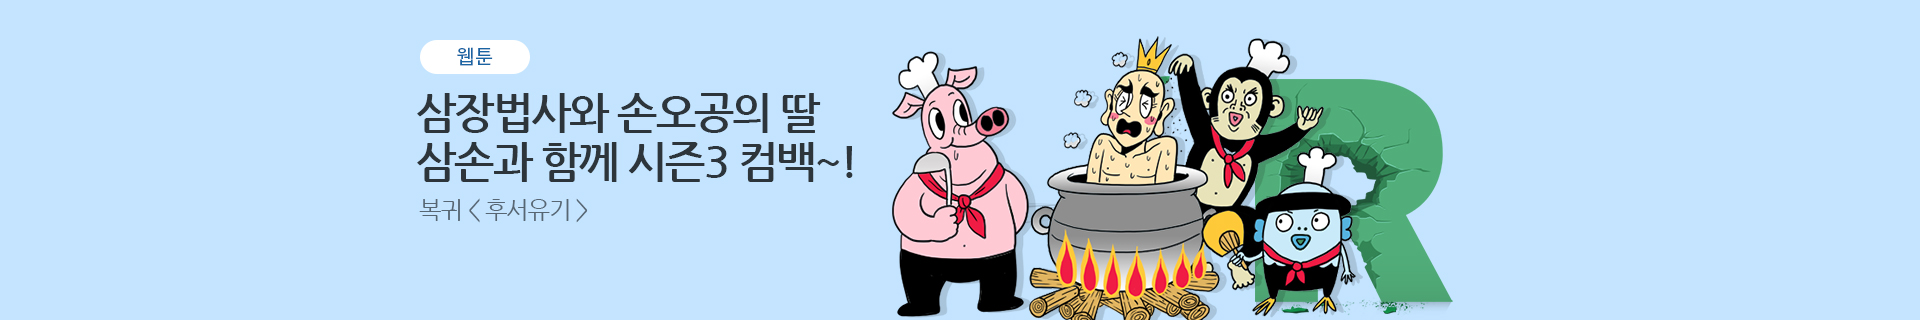 PC_sub_bn_웹툰복귀_후서유기_1920x320_(2).jpg